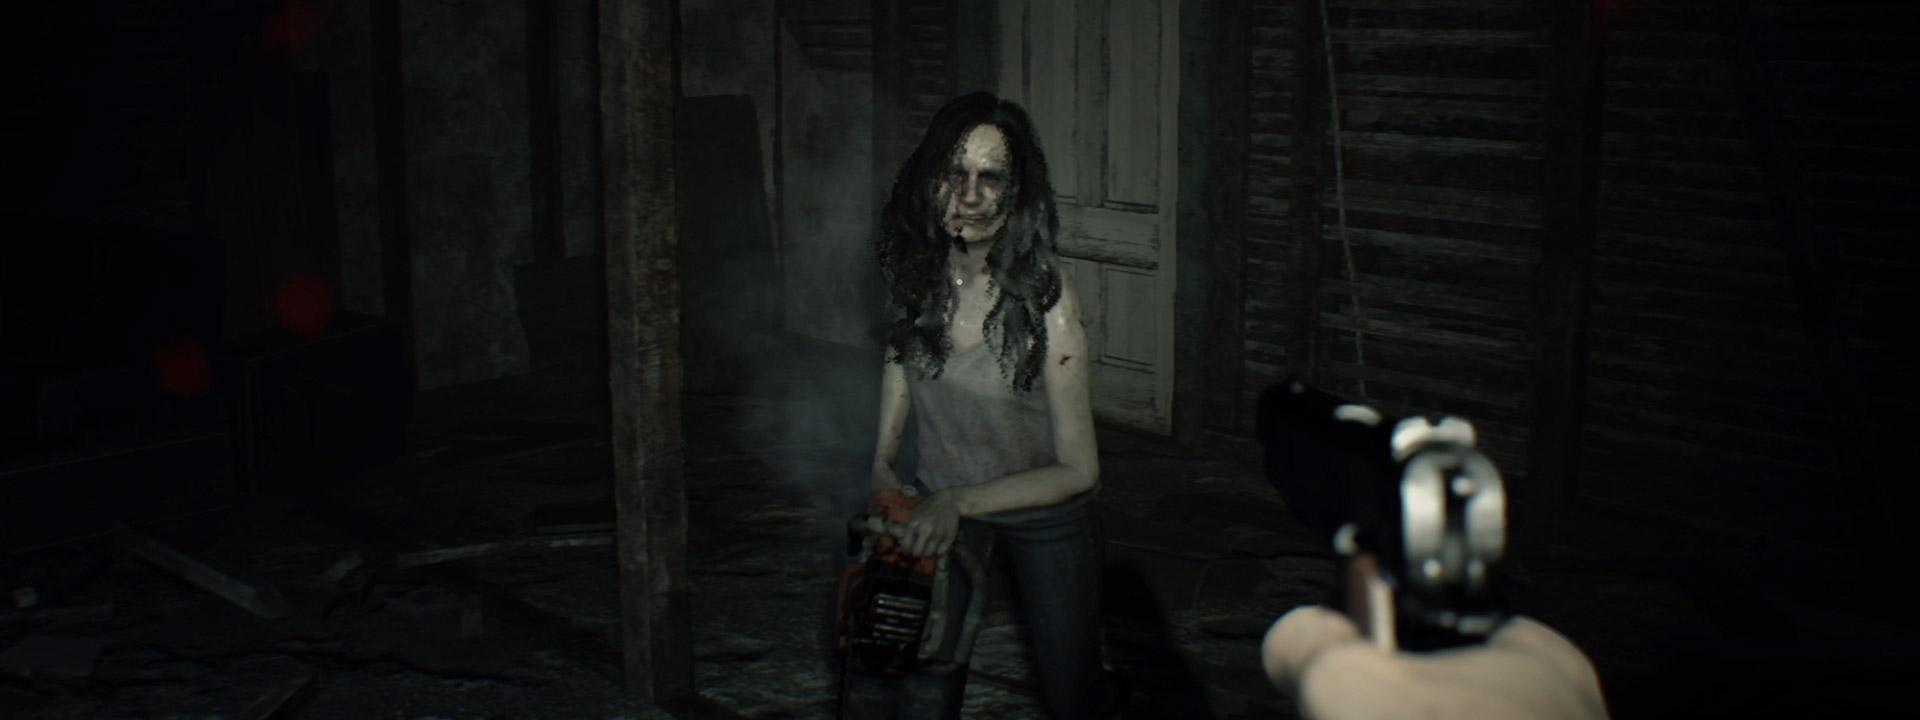 Resident_Evil_7_Komplettlösung_Mia-Kampf2